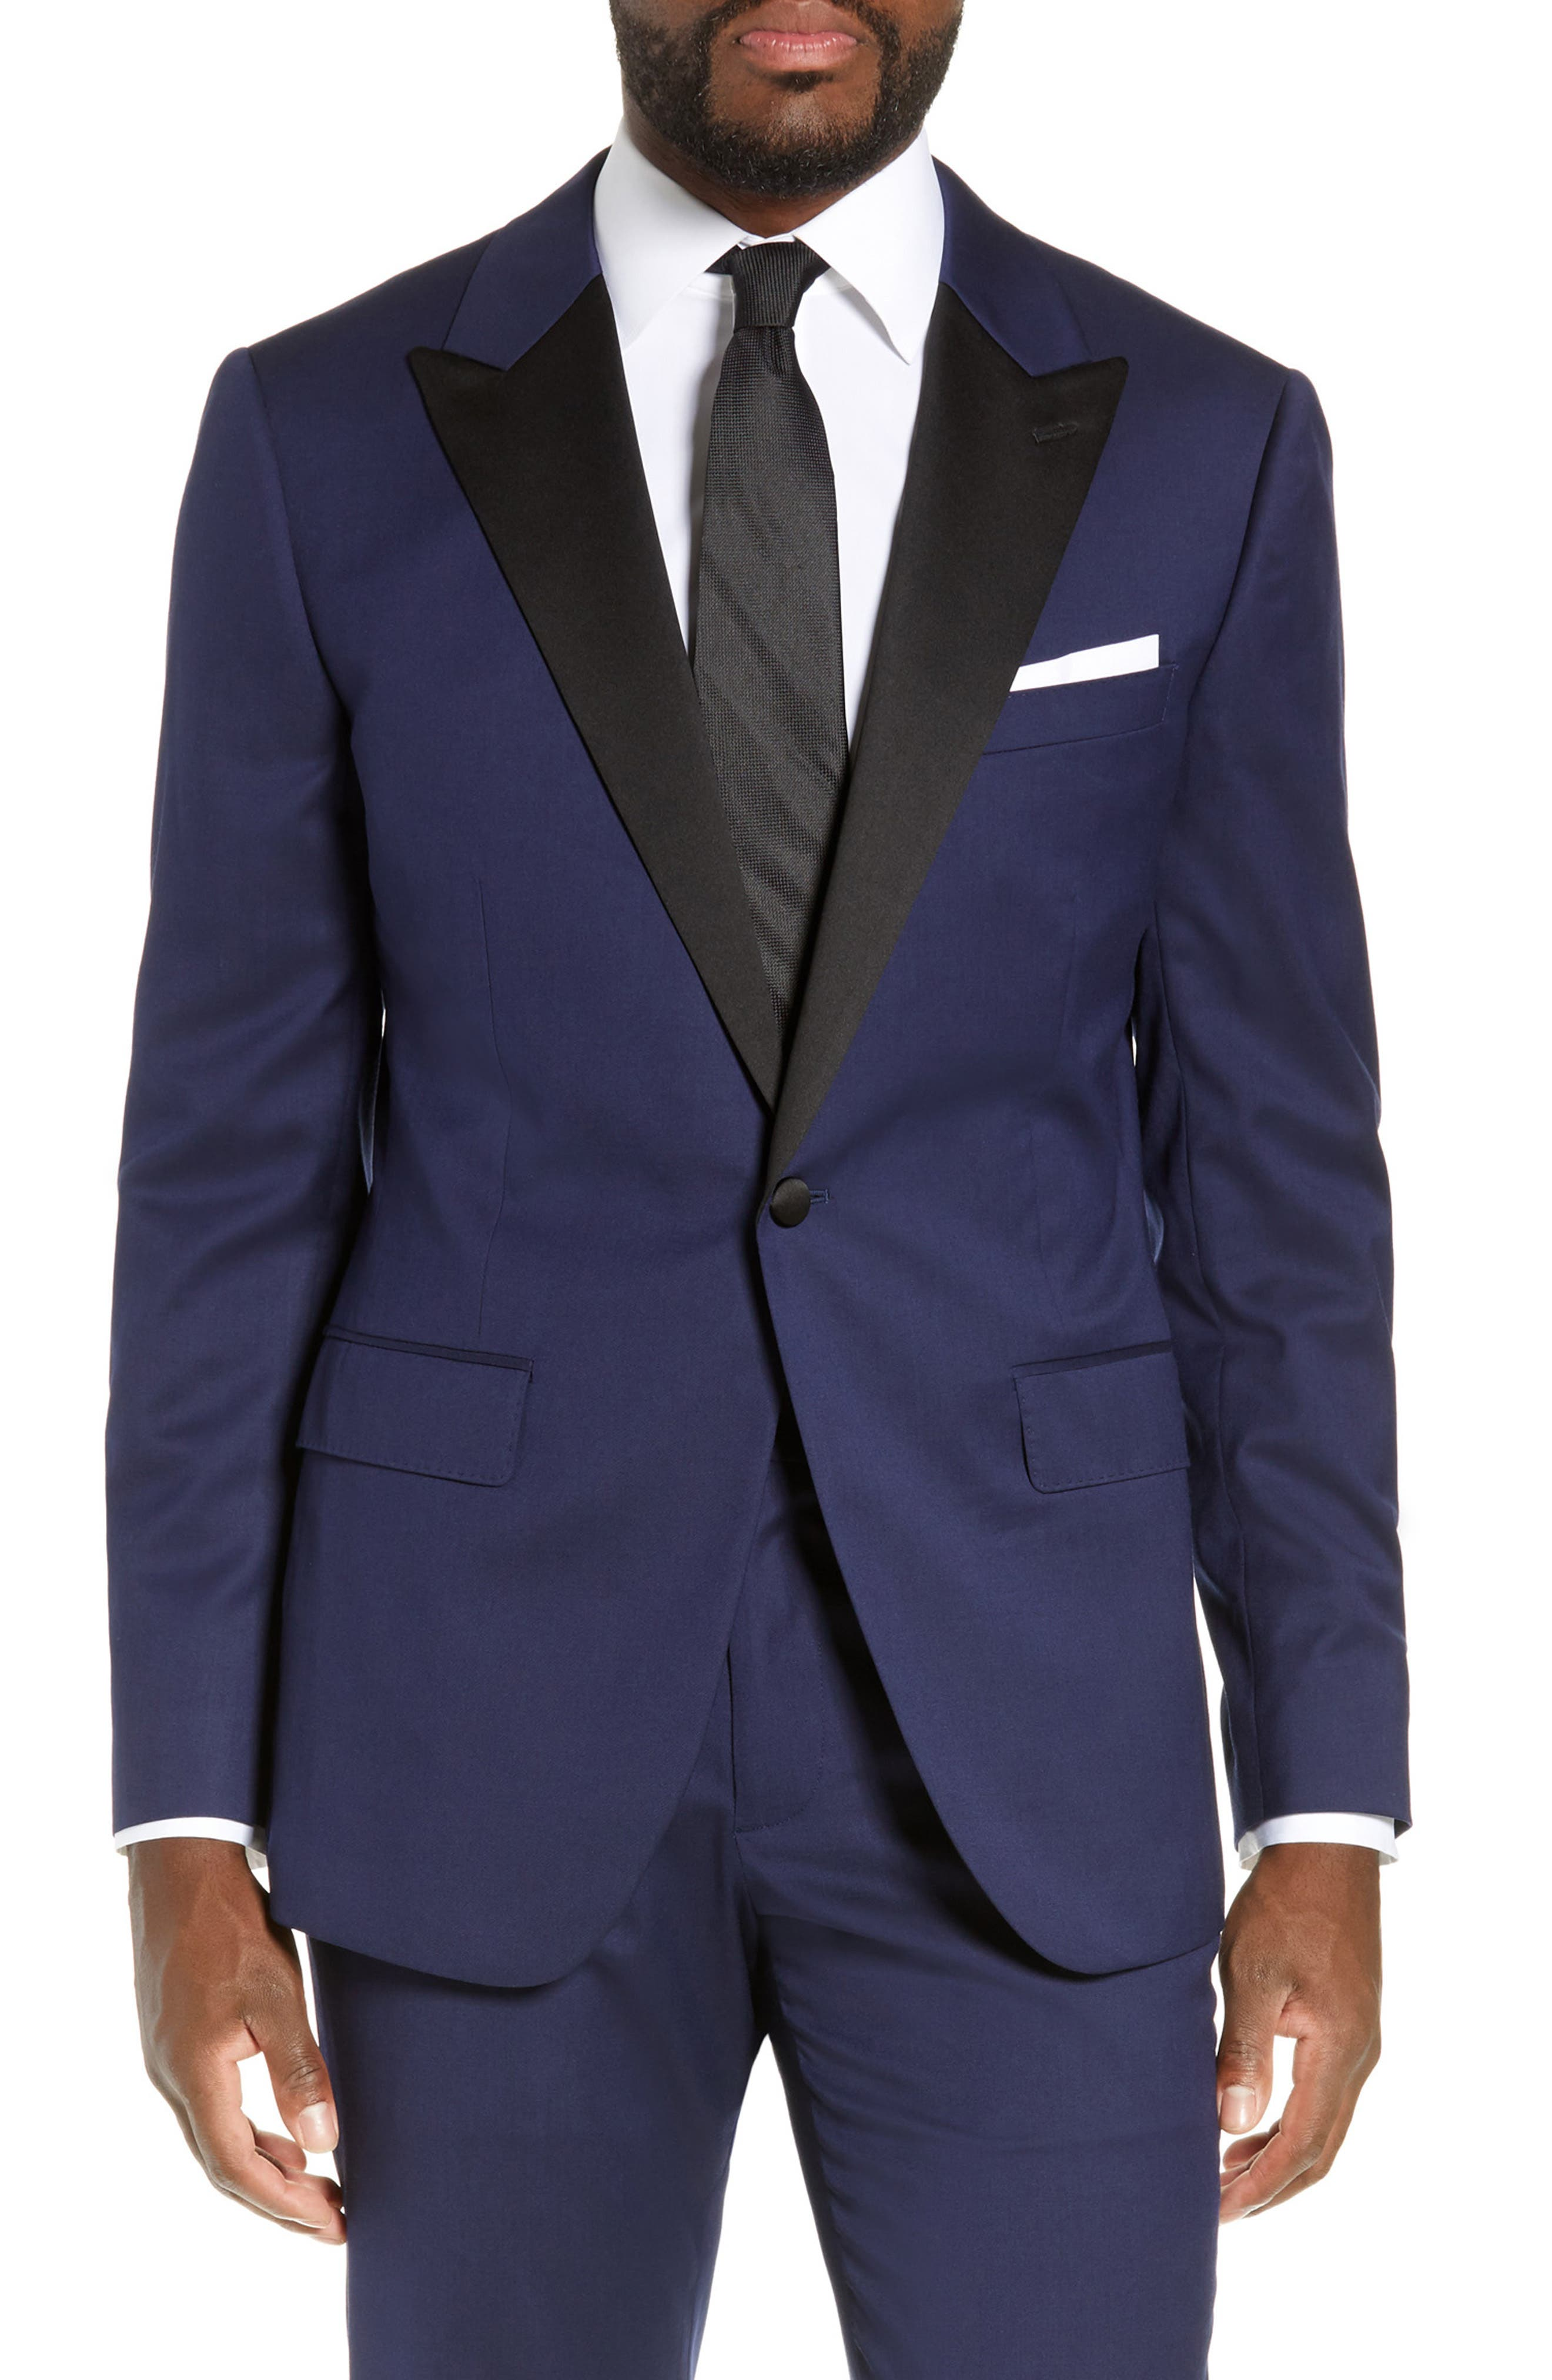 Capstone Slim Fit Italian Wool Blend Dinner Jacket,                         Main,                         color, NAVY